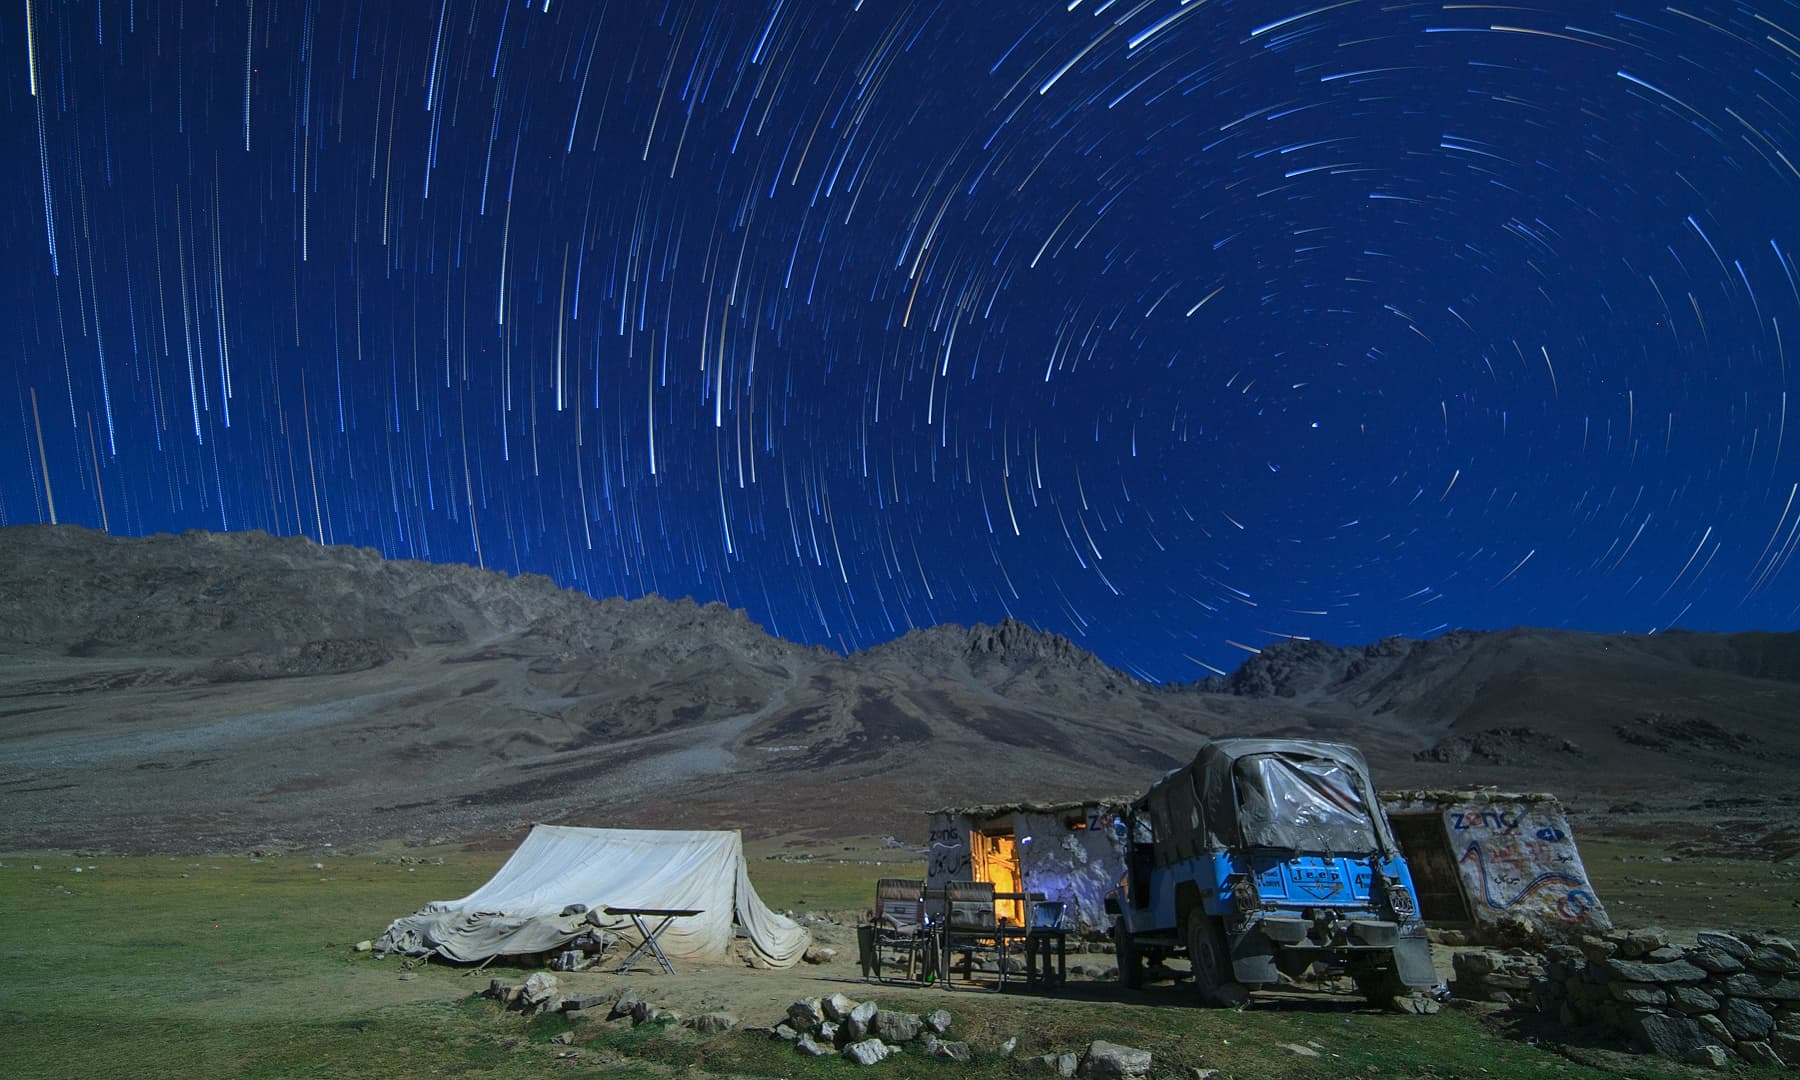 درہ شندور میں رات— سید مہدی بخاری